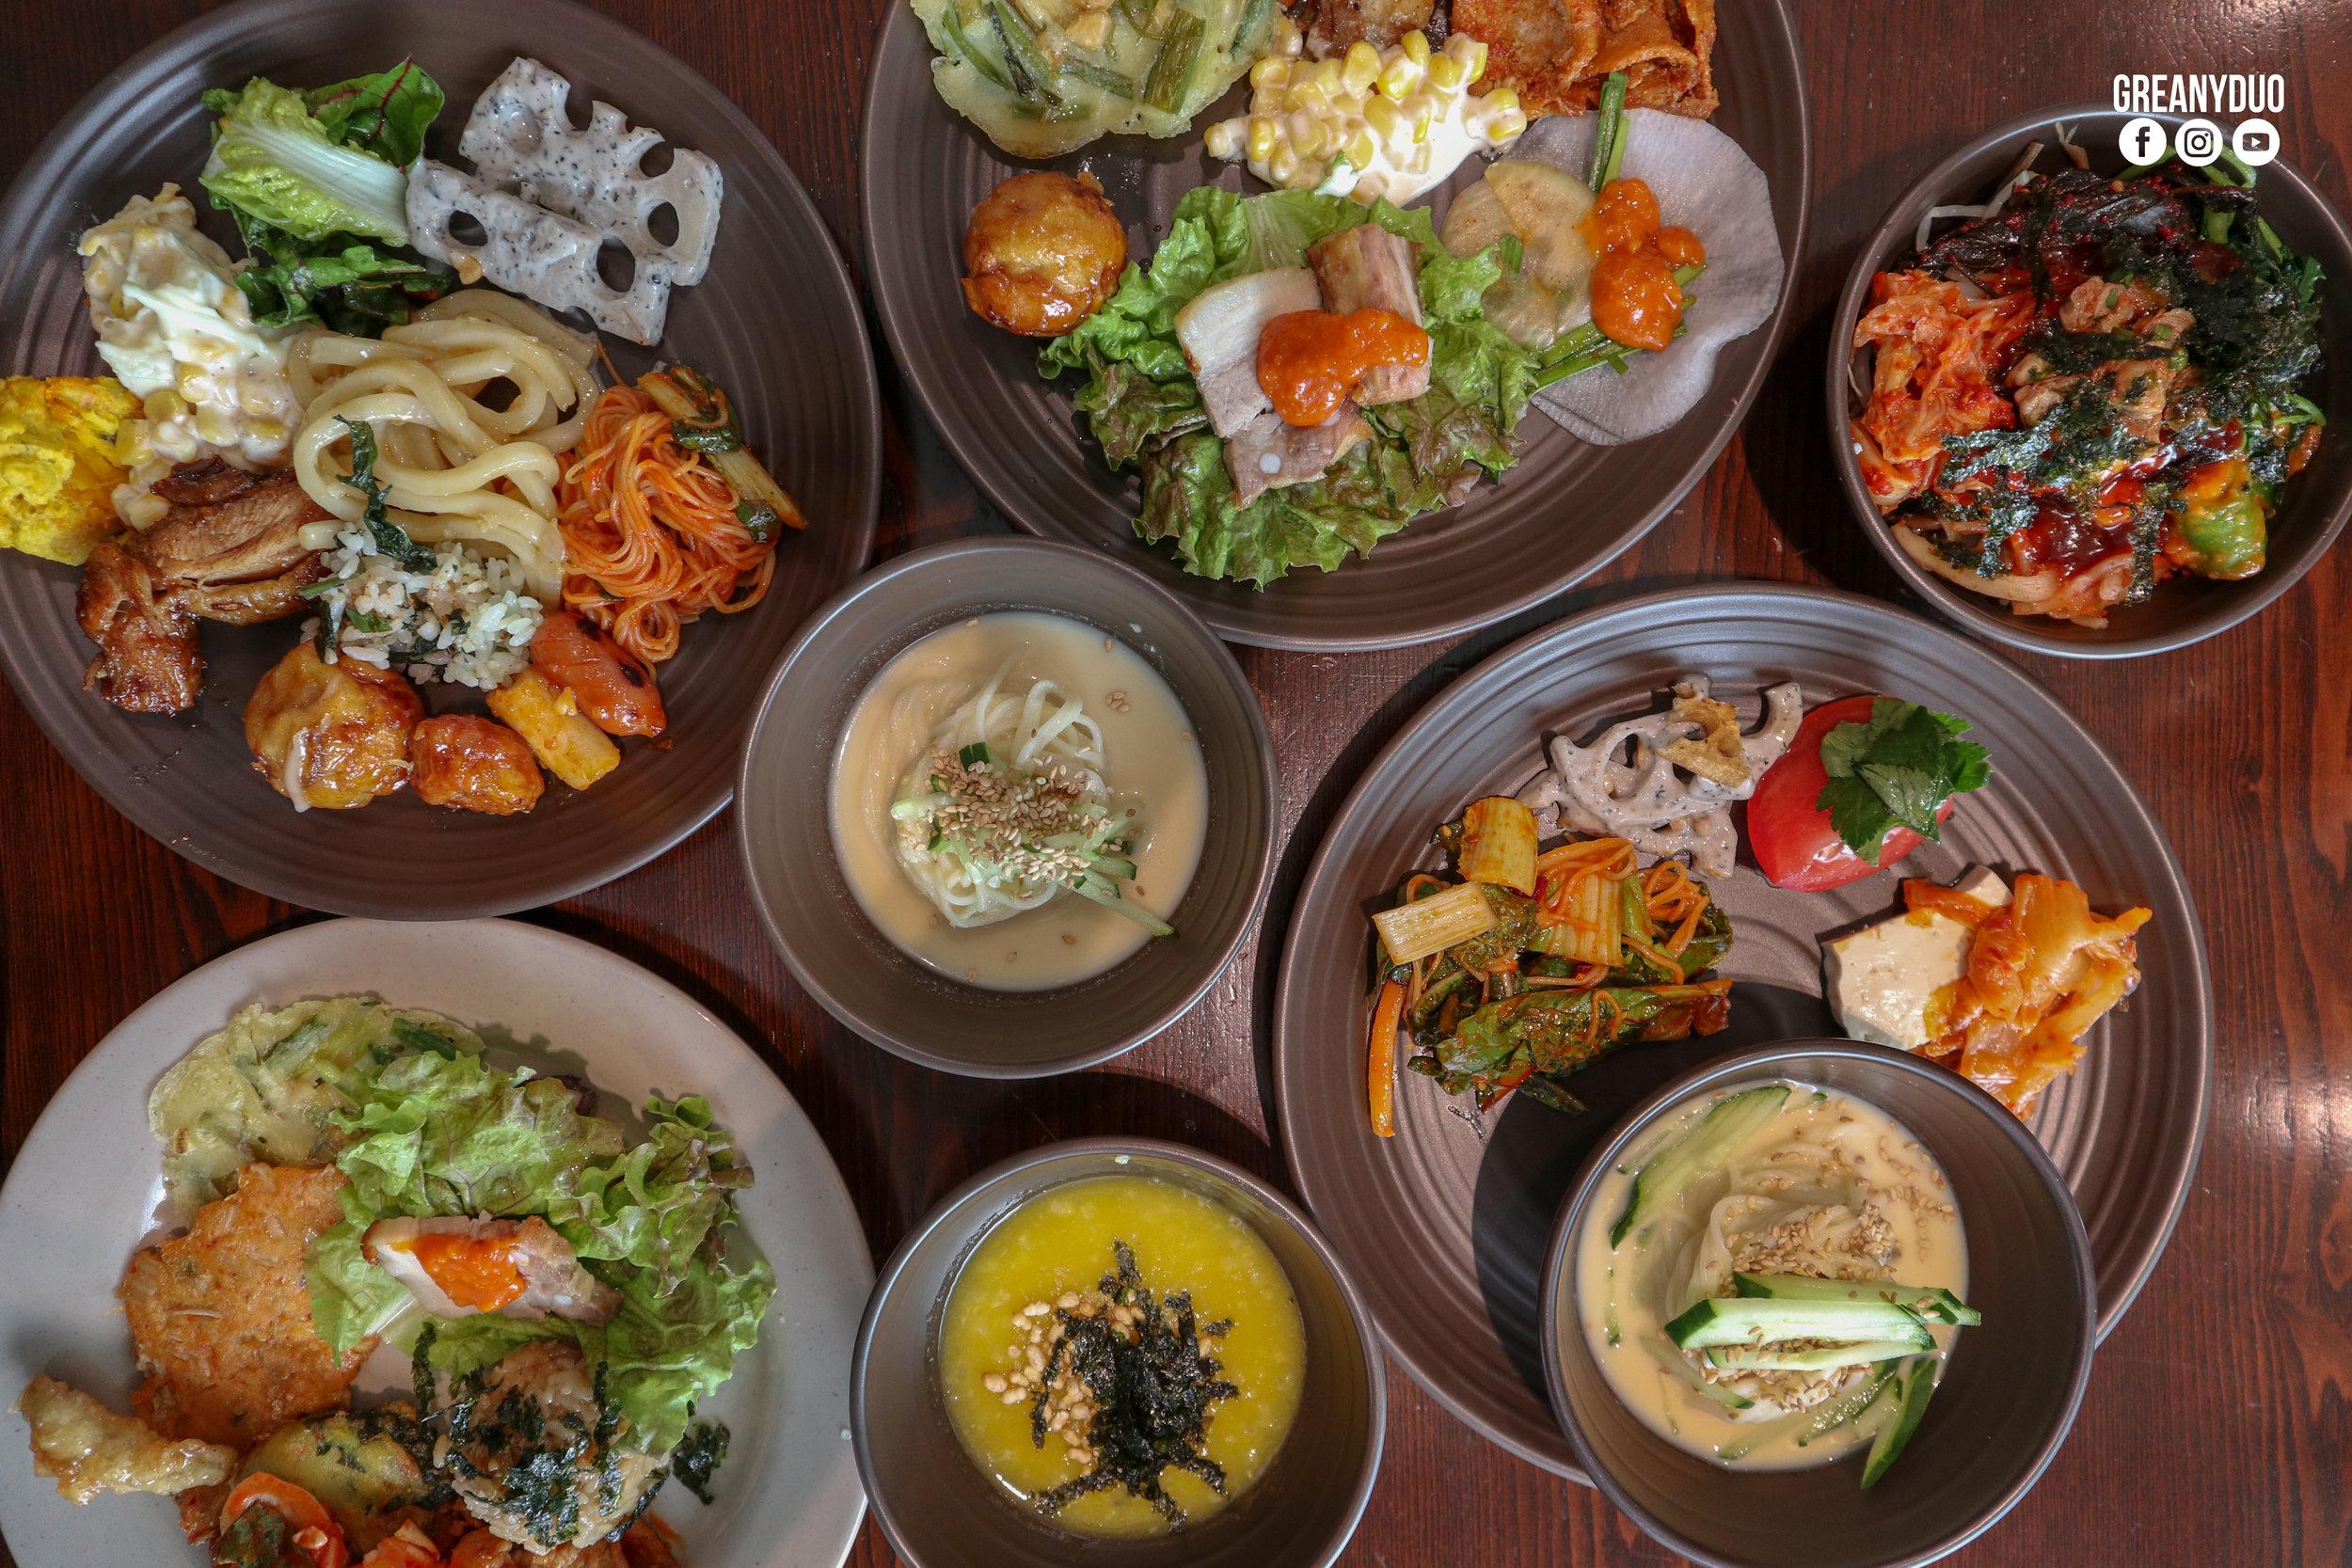 014Seoul_Food_WM.jpg